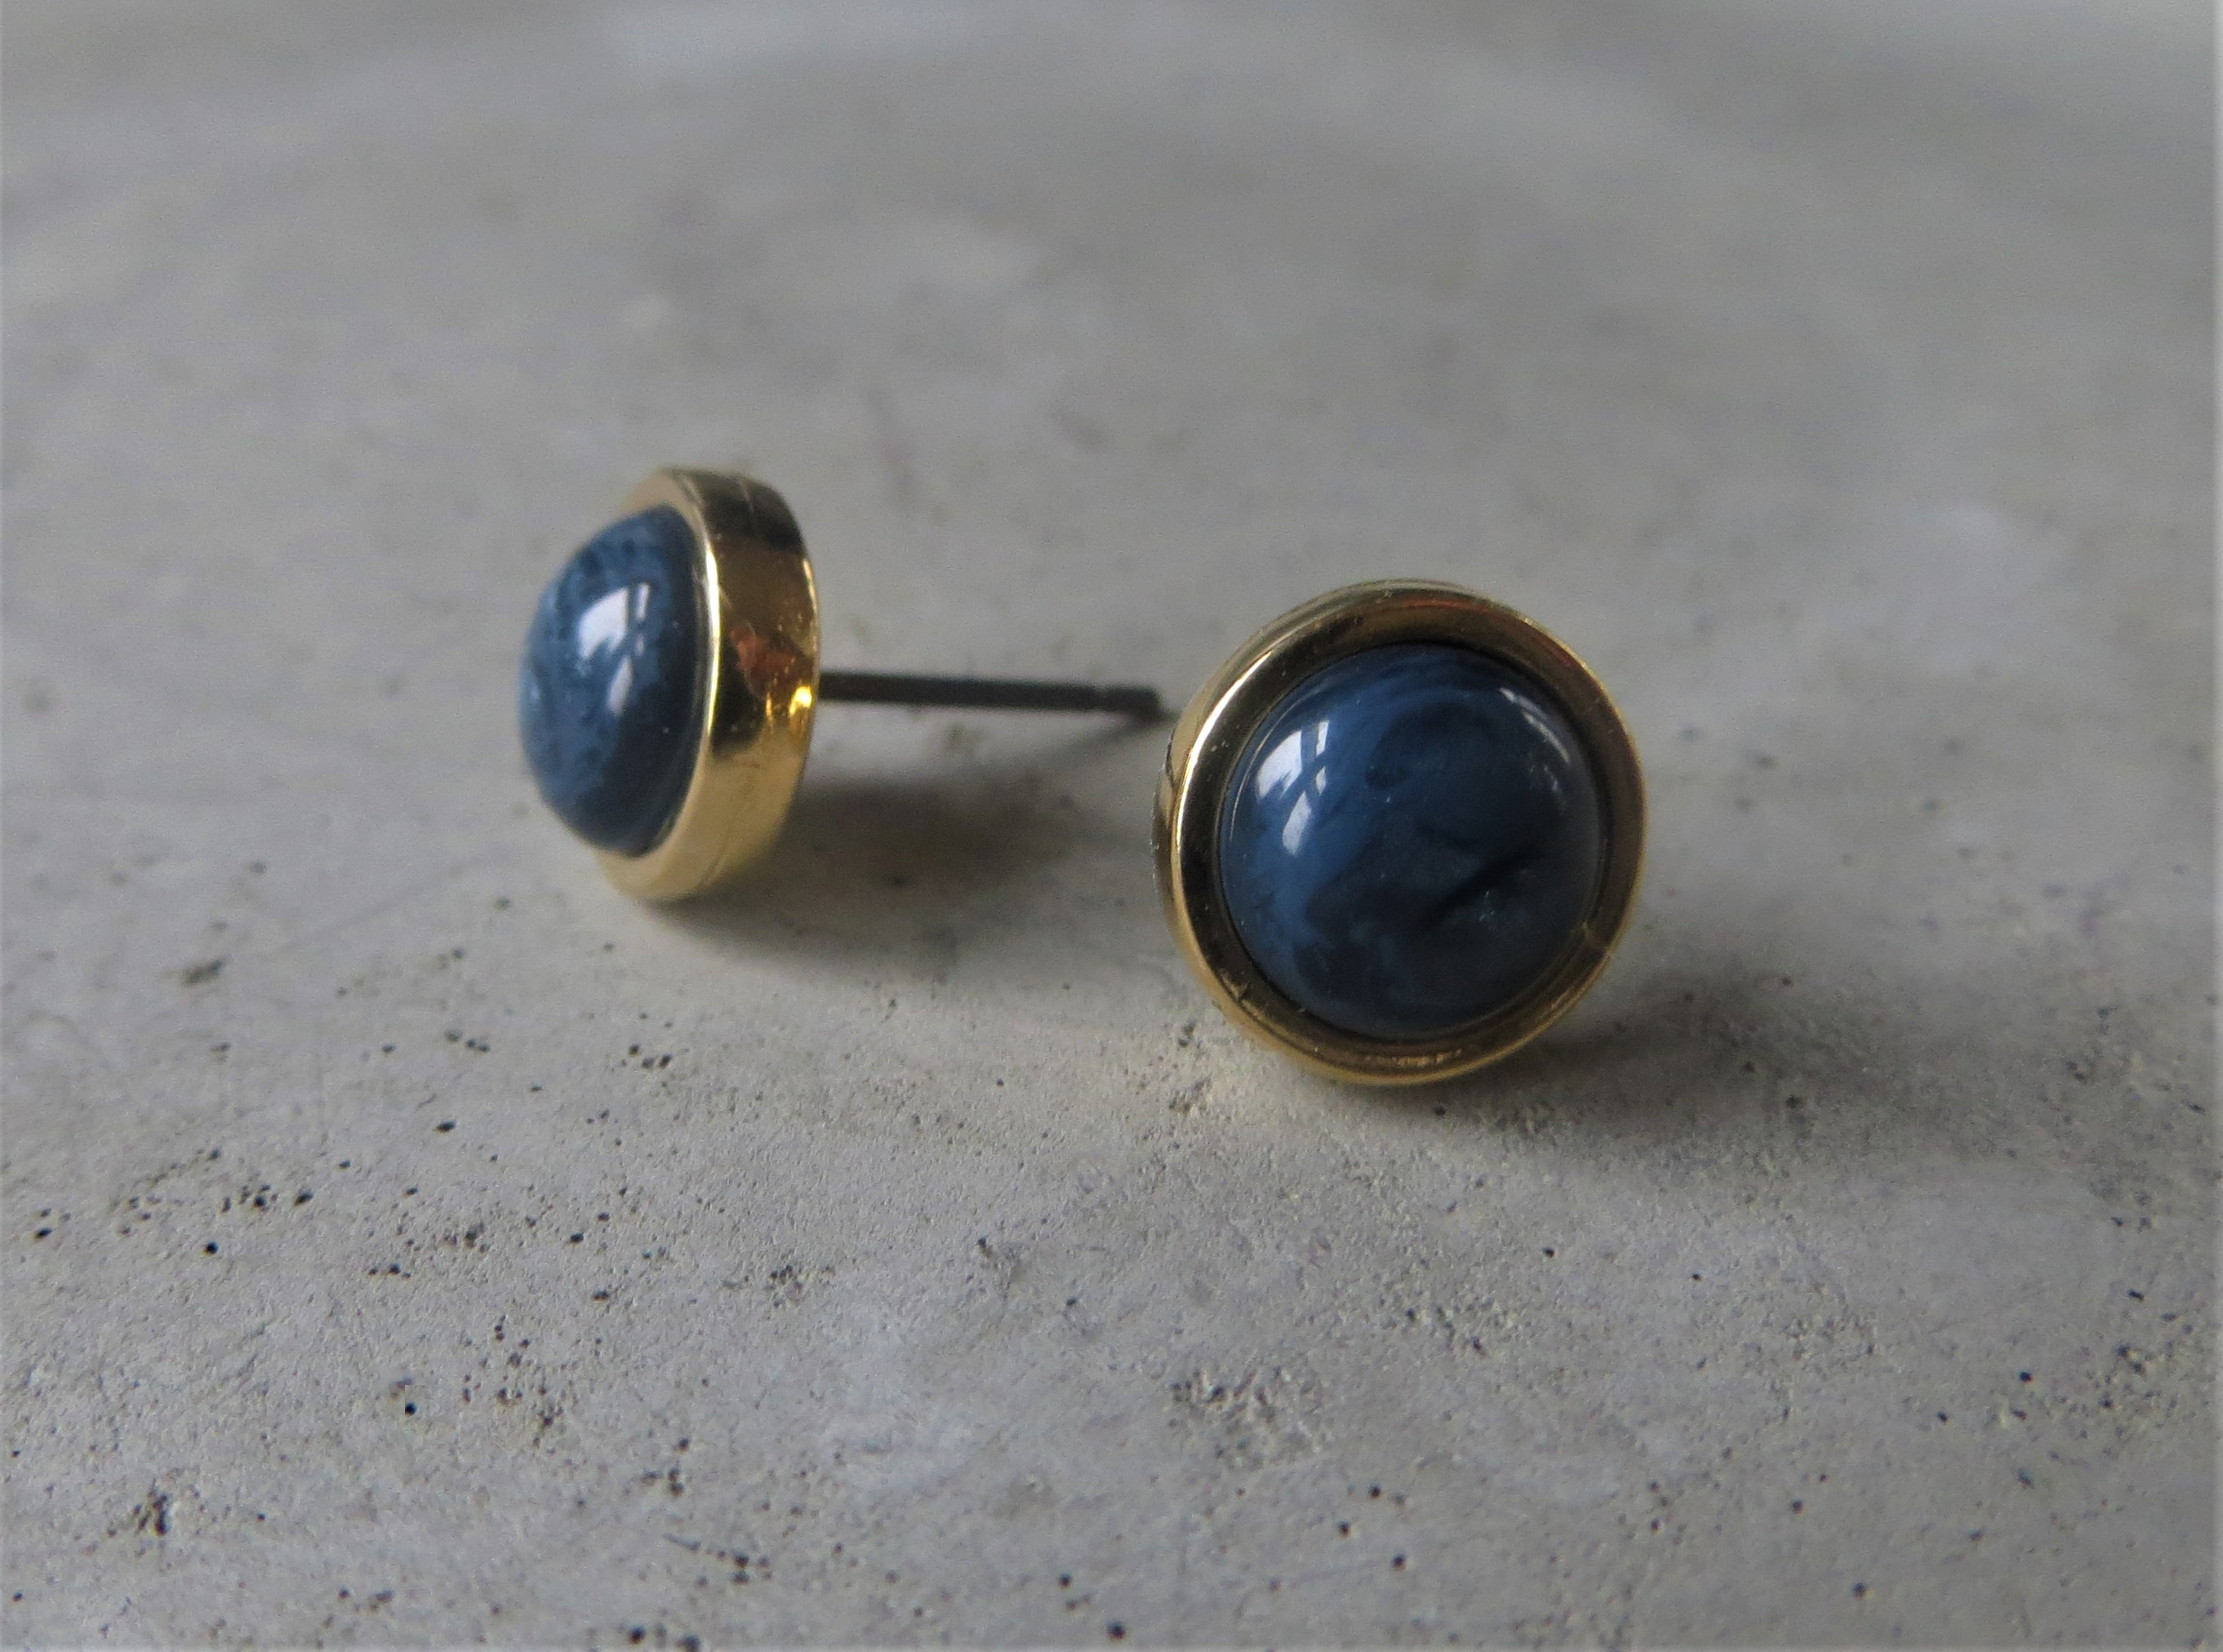 Ohrringe - QOSS Ohrring Ohrstecker BO GOLD Jeansblau  - Onlineshop Tante Emmer